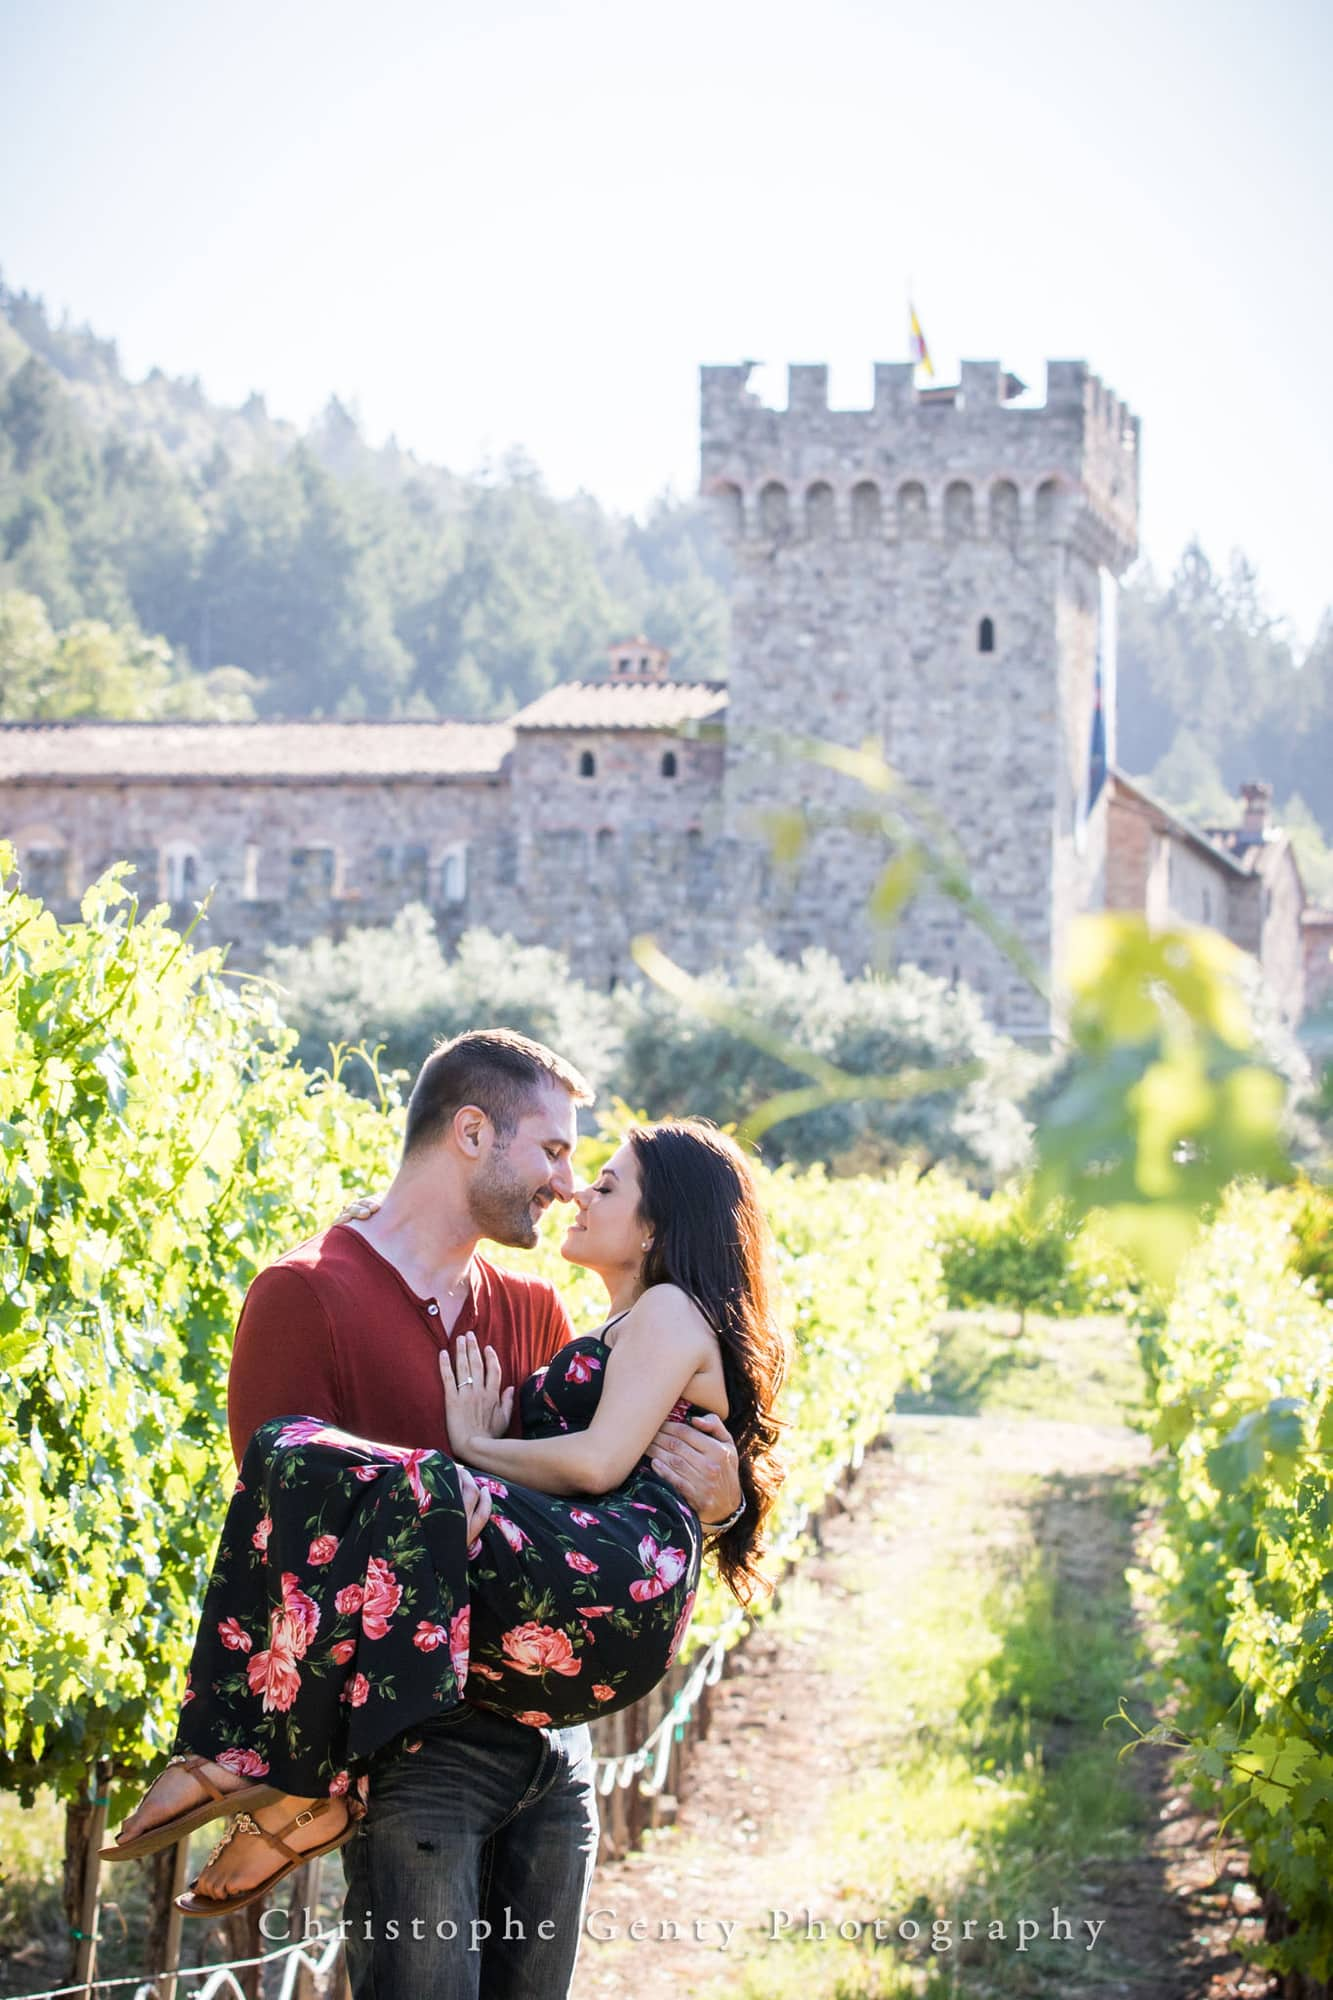 Castello di Amorosa Marriage Proposal Photography 320